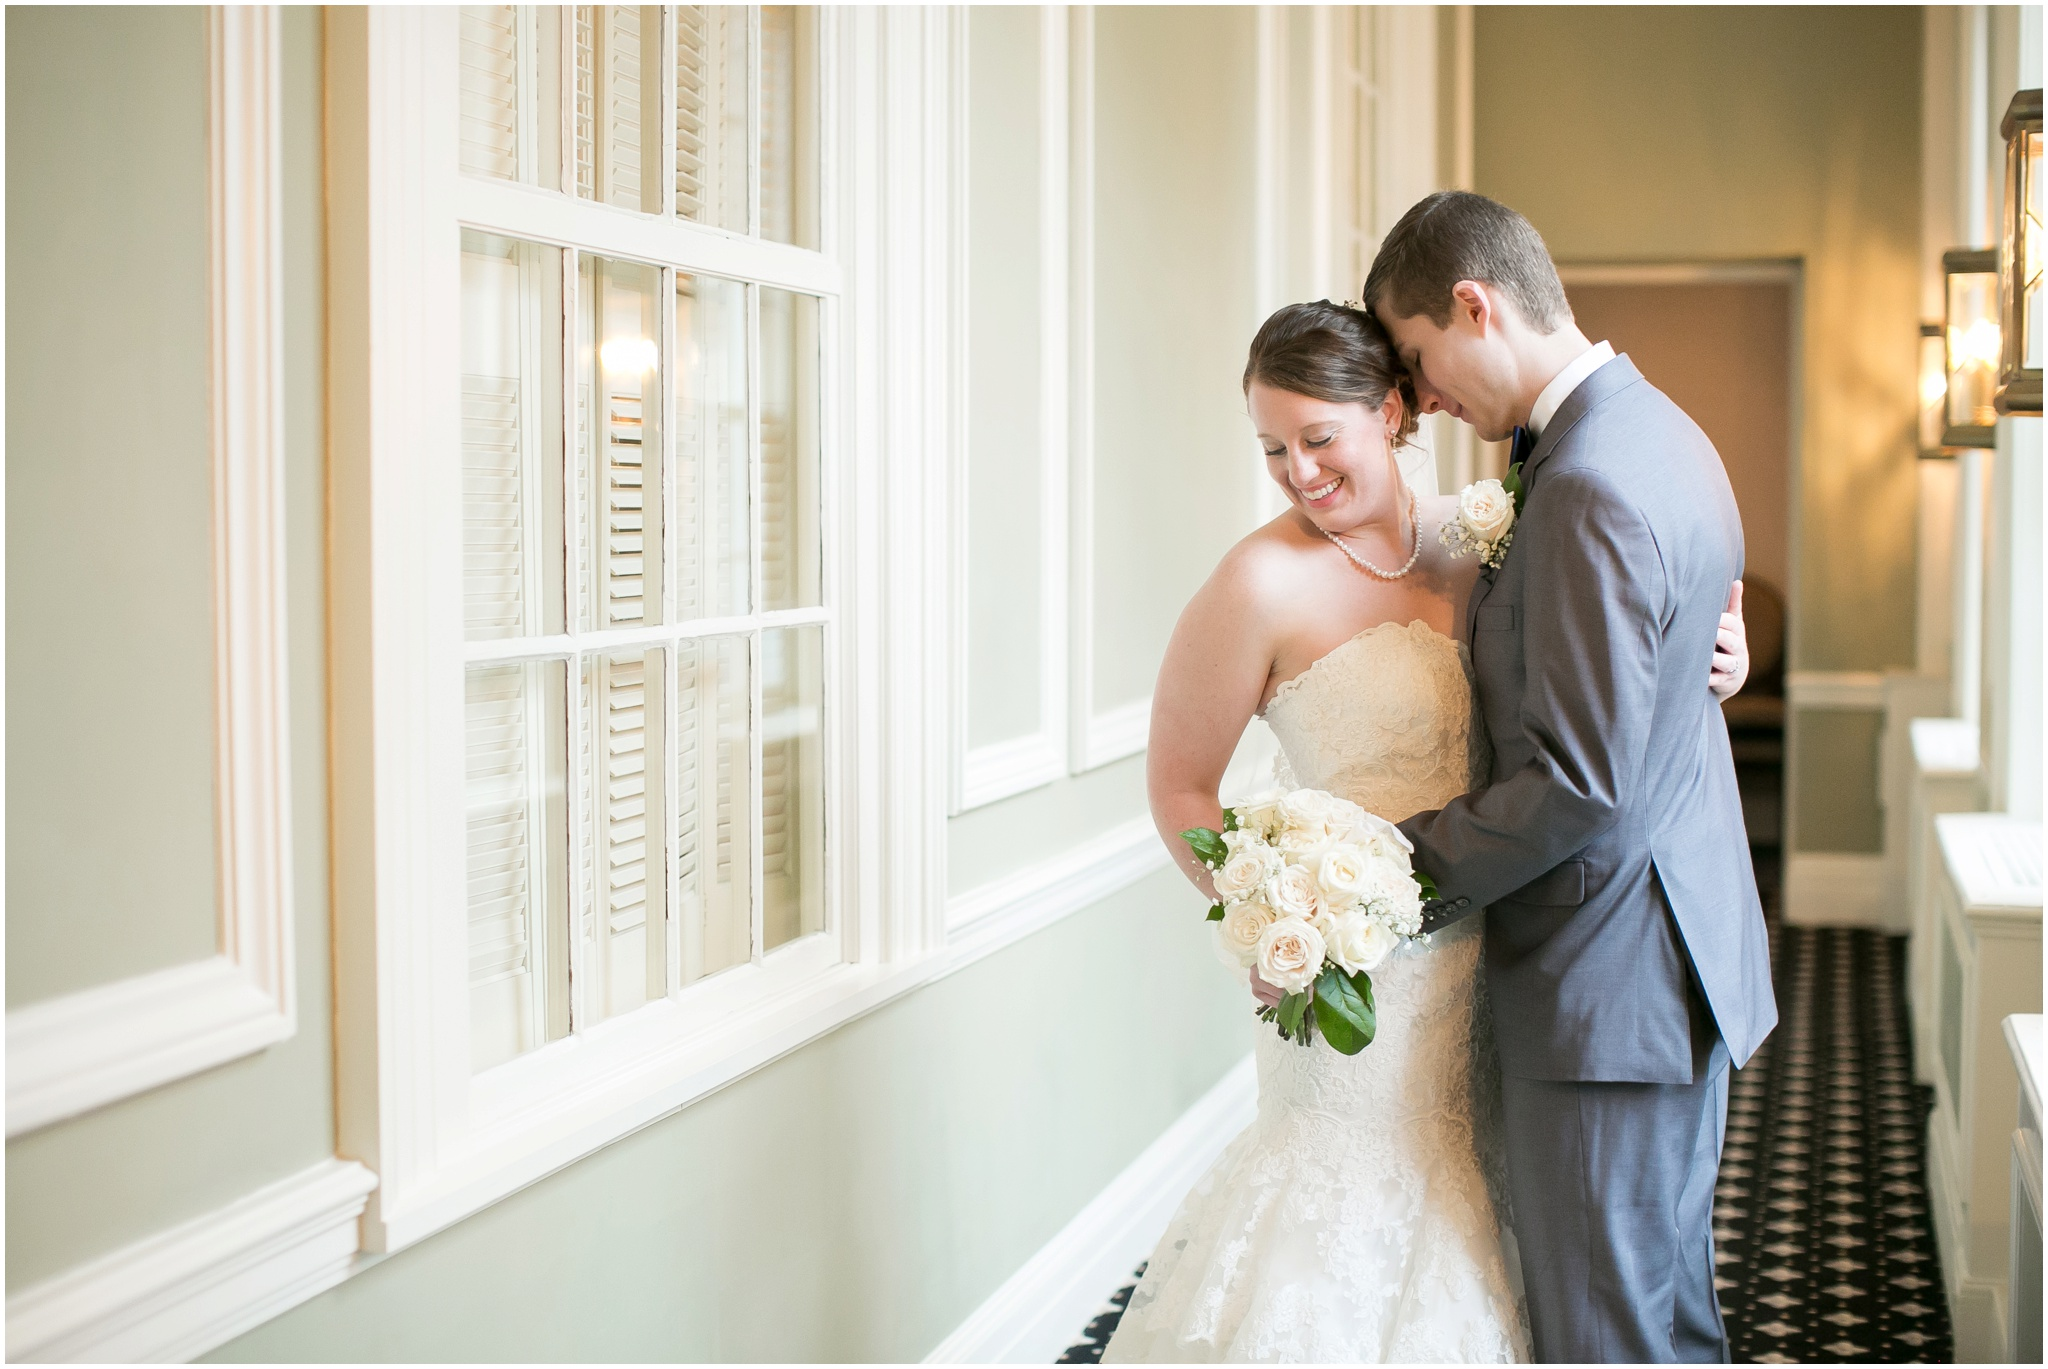 Madison_Club_Madison_Wisconsin_Wedding_Photographer_Spring_Rainy_Wedding_2636.jpg